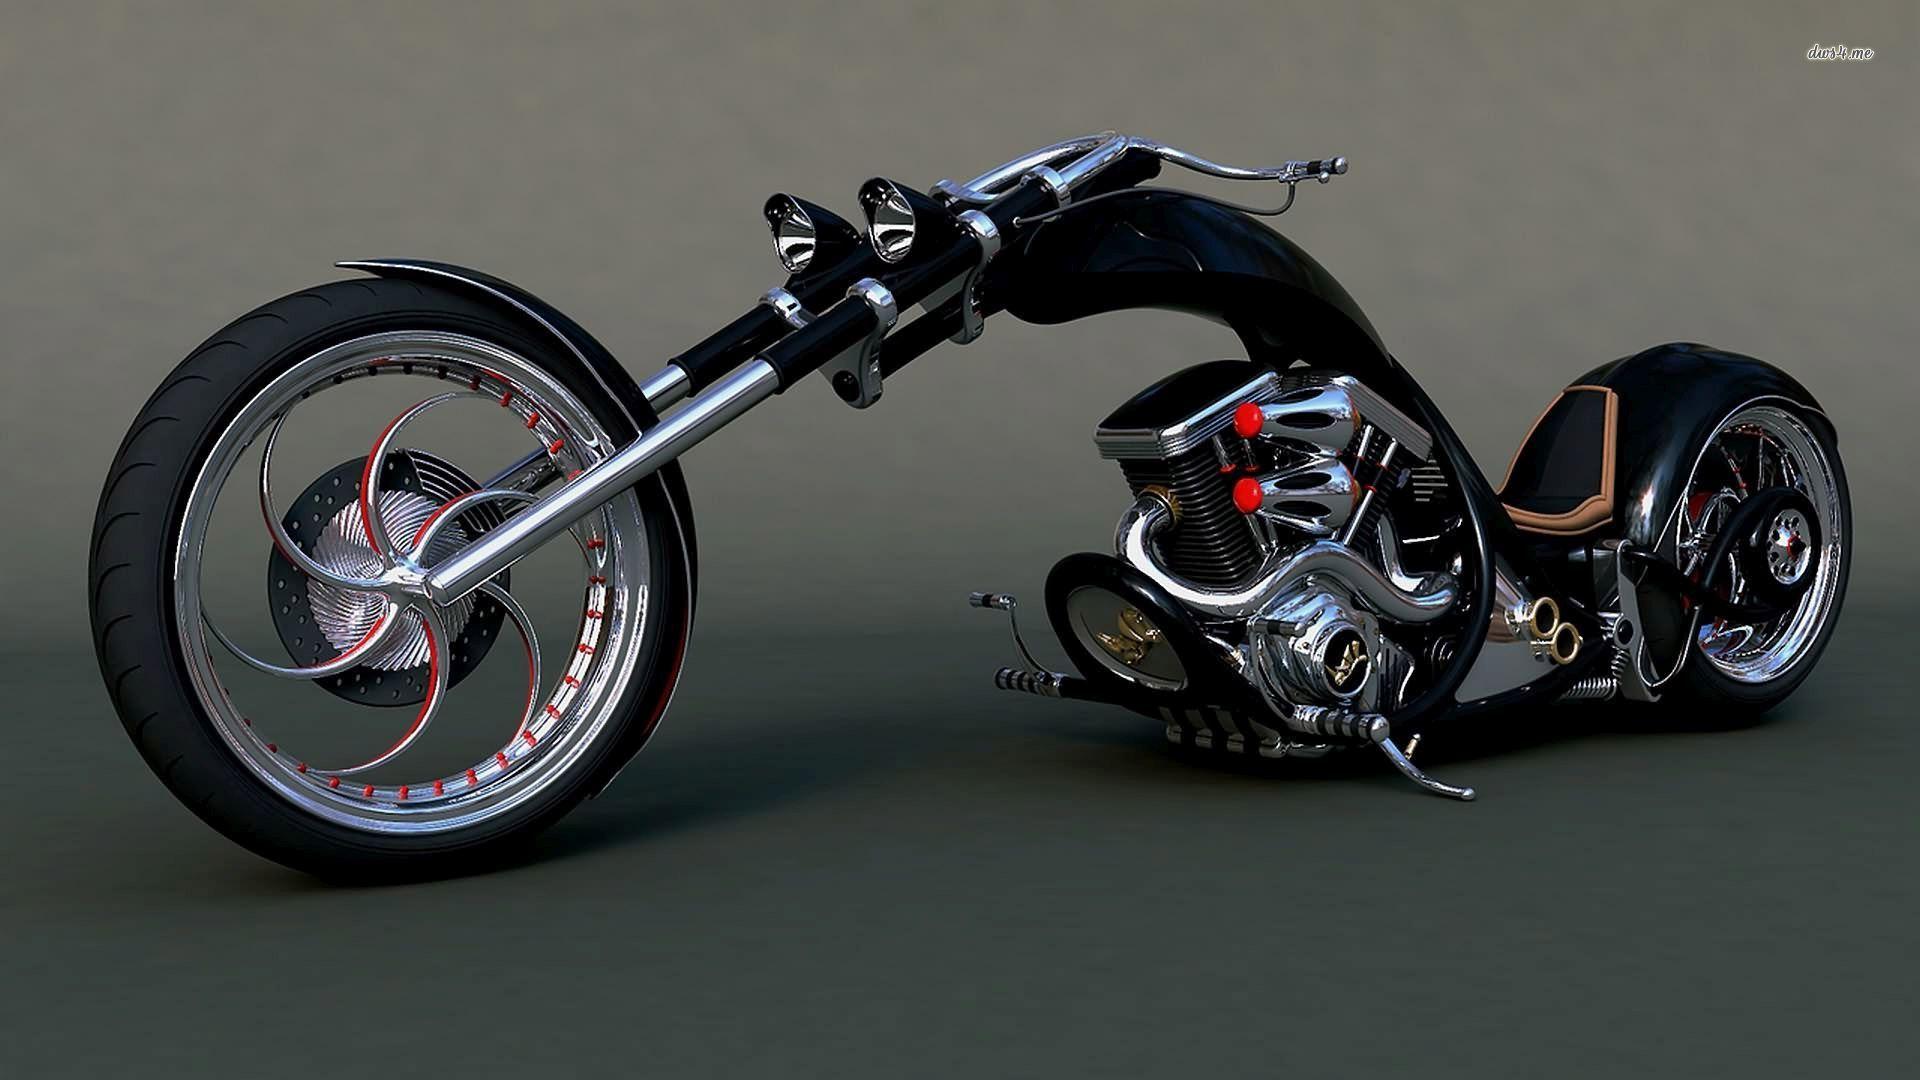 29046 Harley Chopper Motorcycle Wallpaper - Harley Davidson Chopper Bike - HD Wallpaper